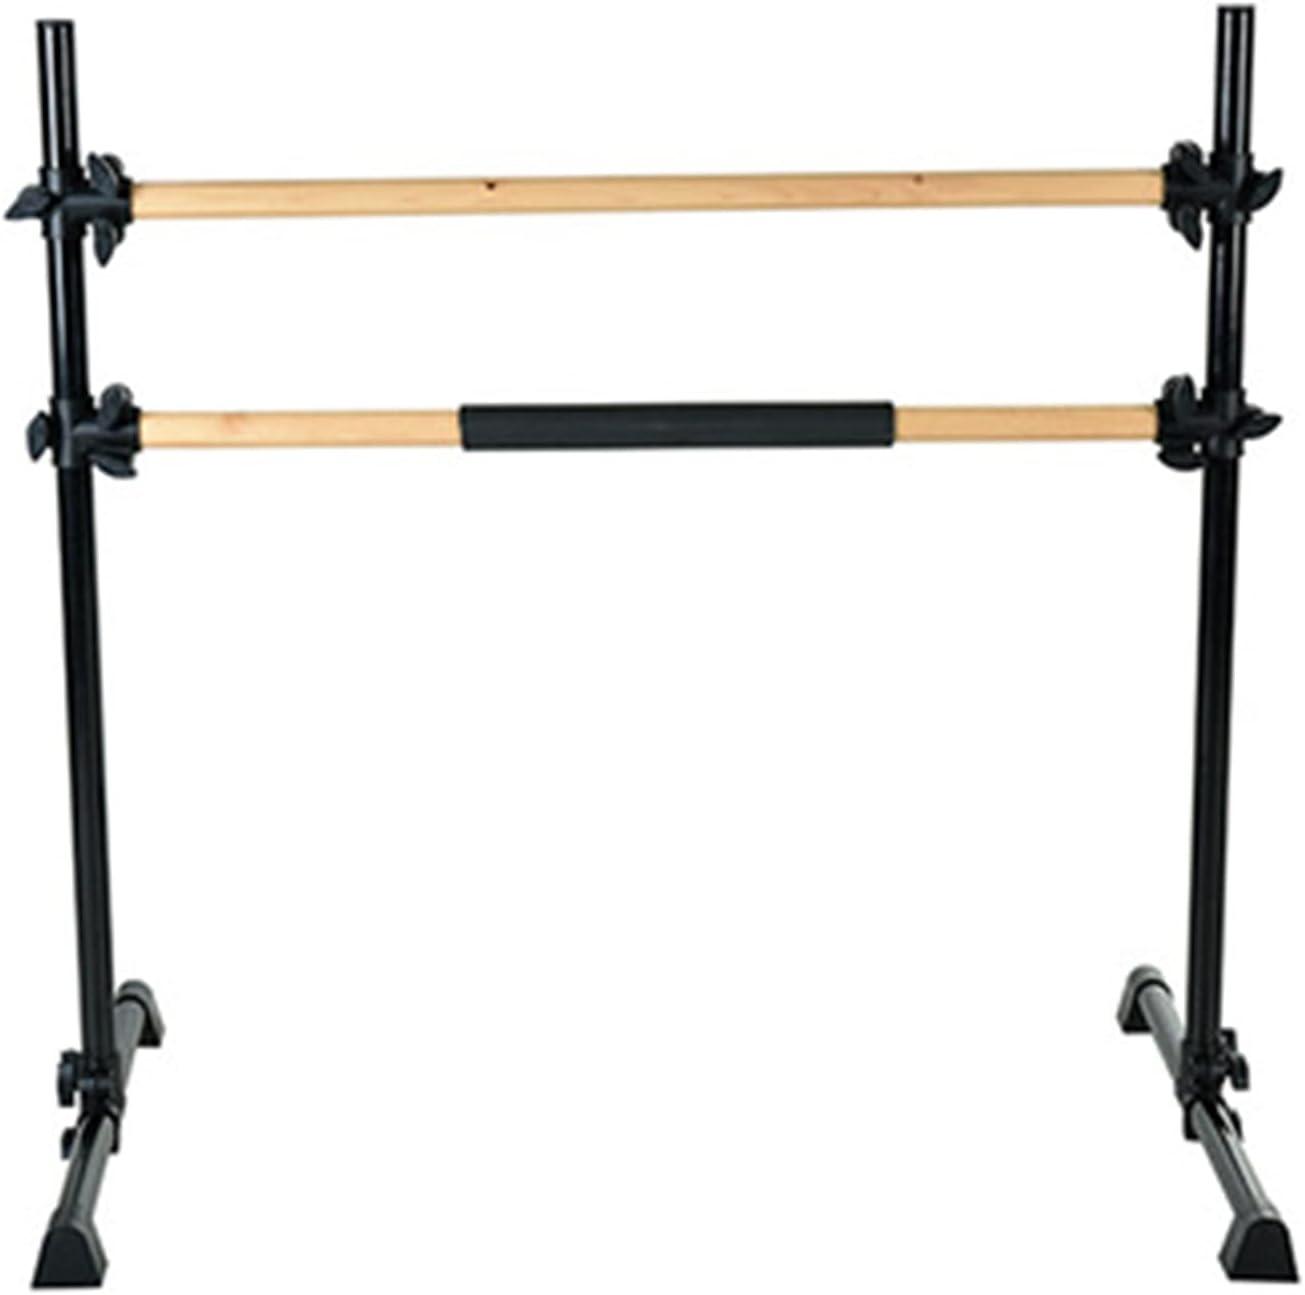 QERNTPEY Ballet Max 85% OFF Bar Portable Adjustable B Anti-Slip Barre Deluxe